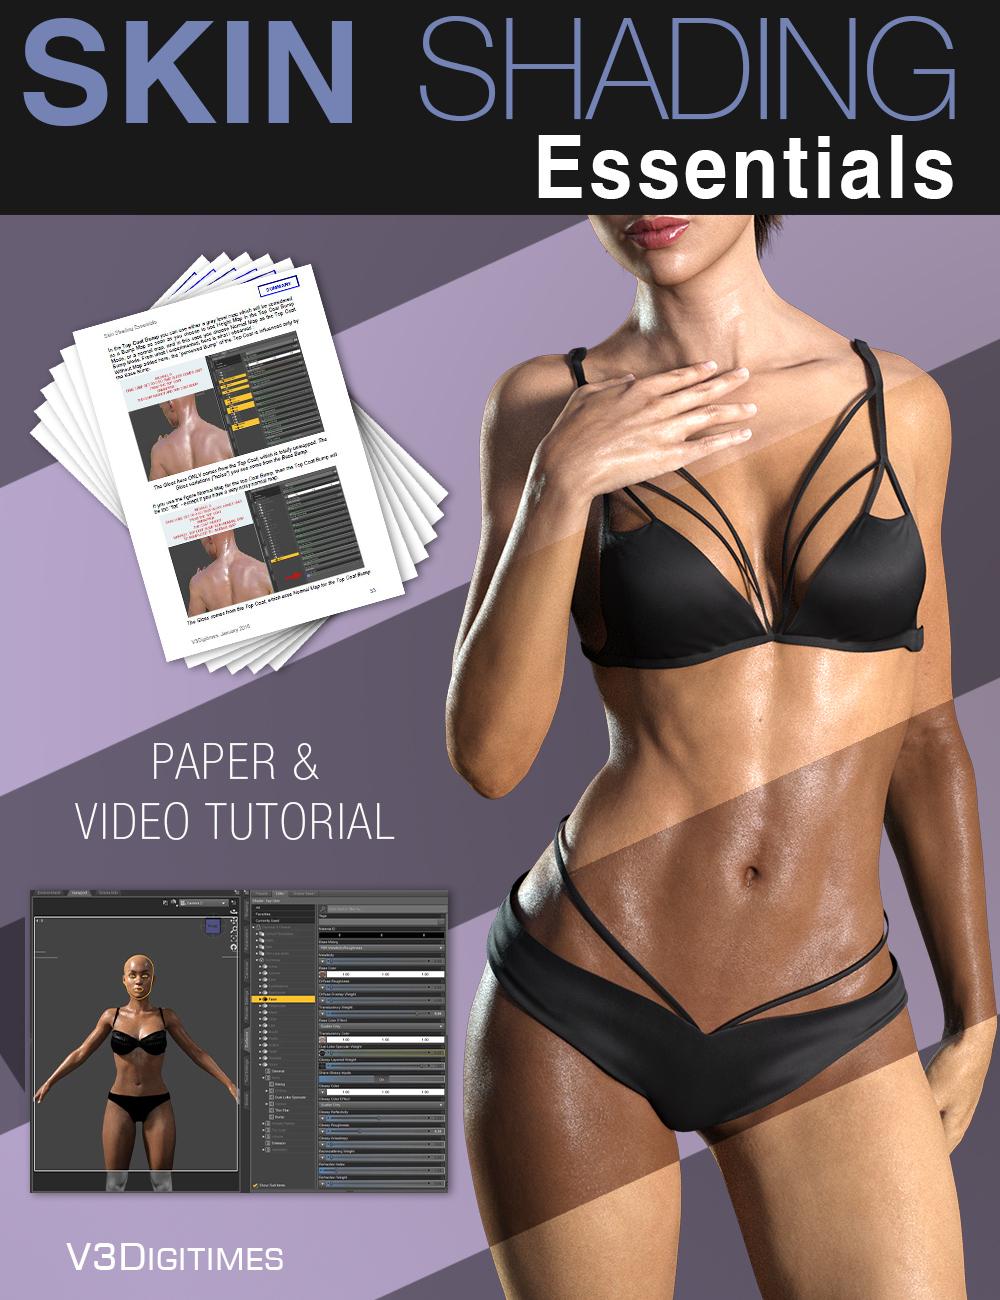 Skin Shading Essentials Tutorial by: V3Digitimes, 3D Models by Daz 3D